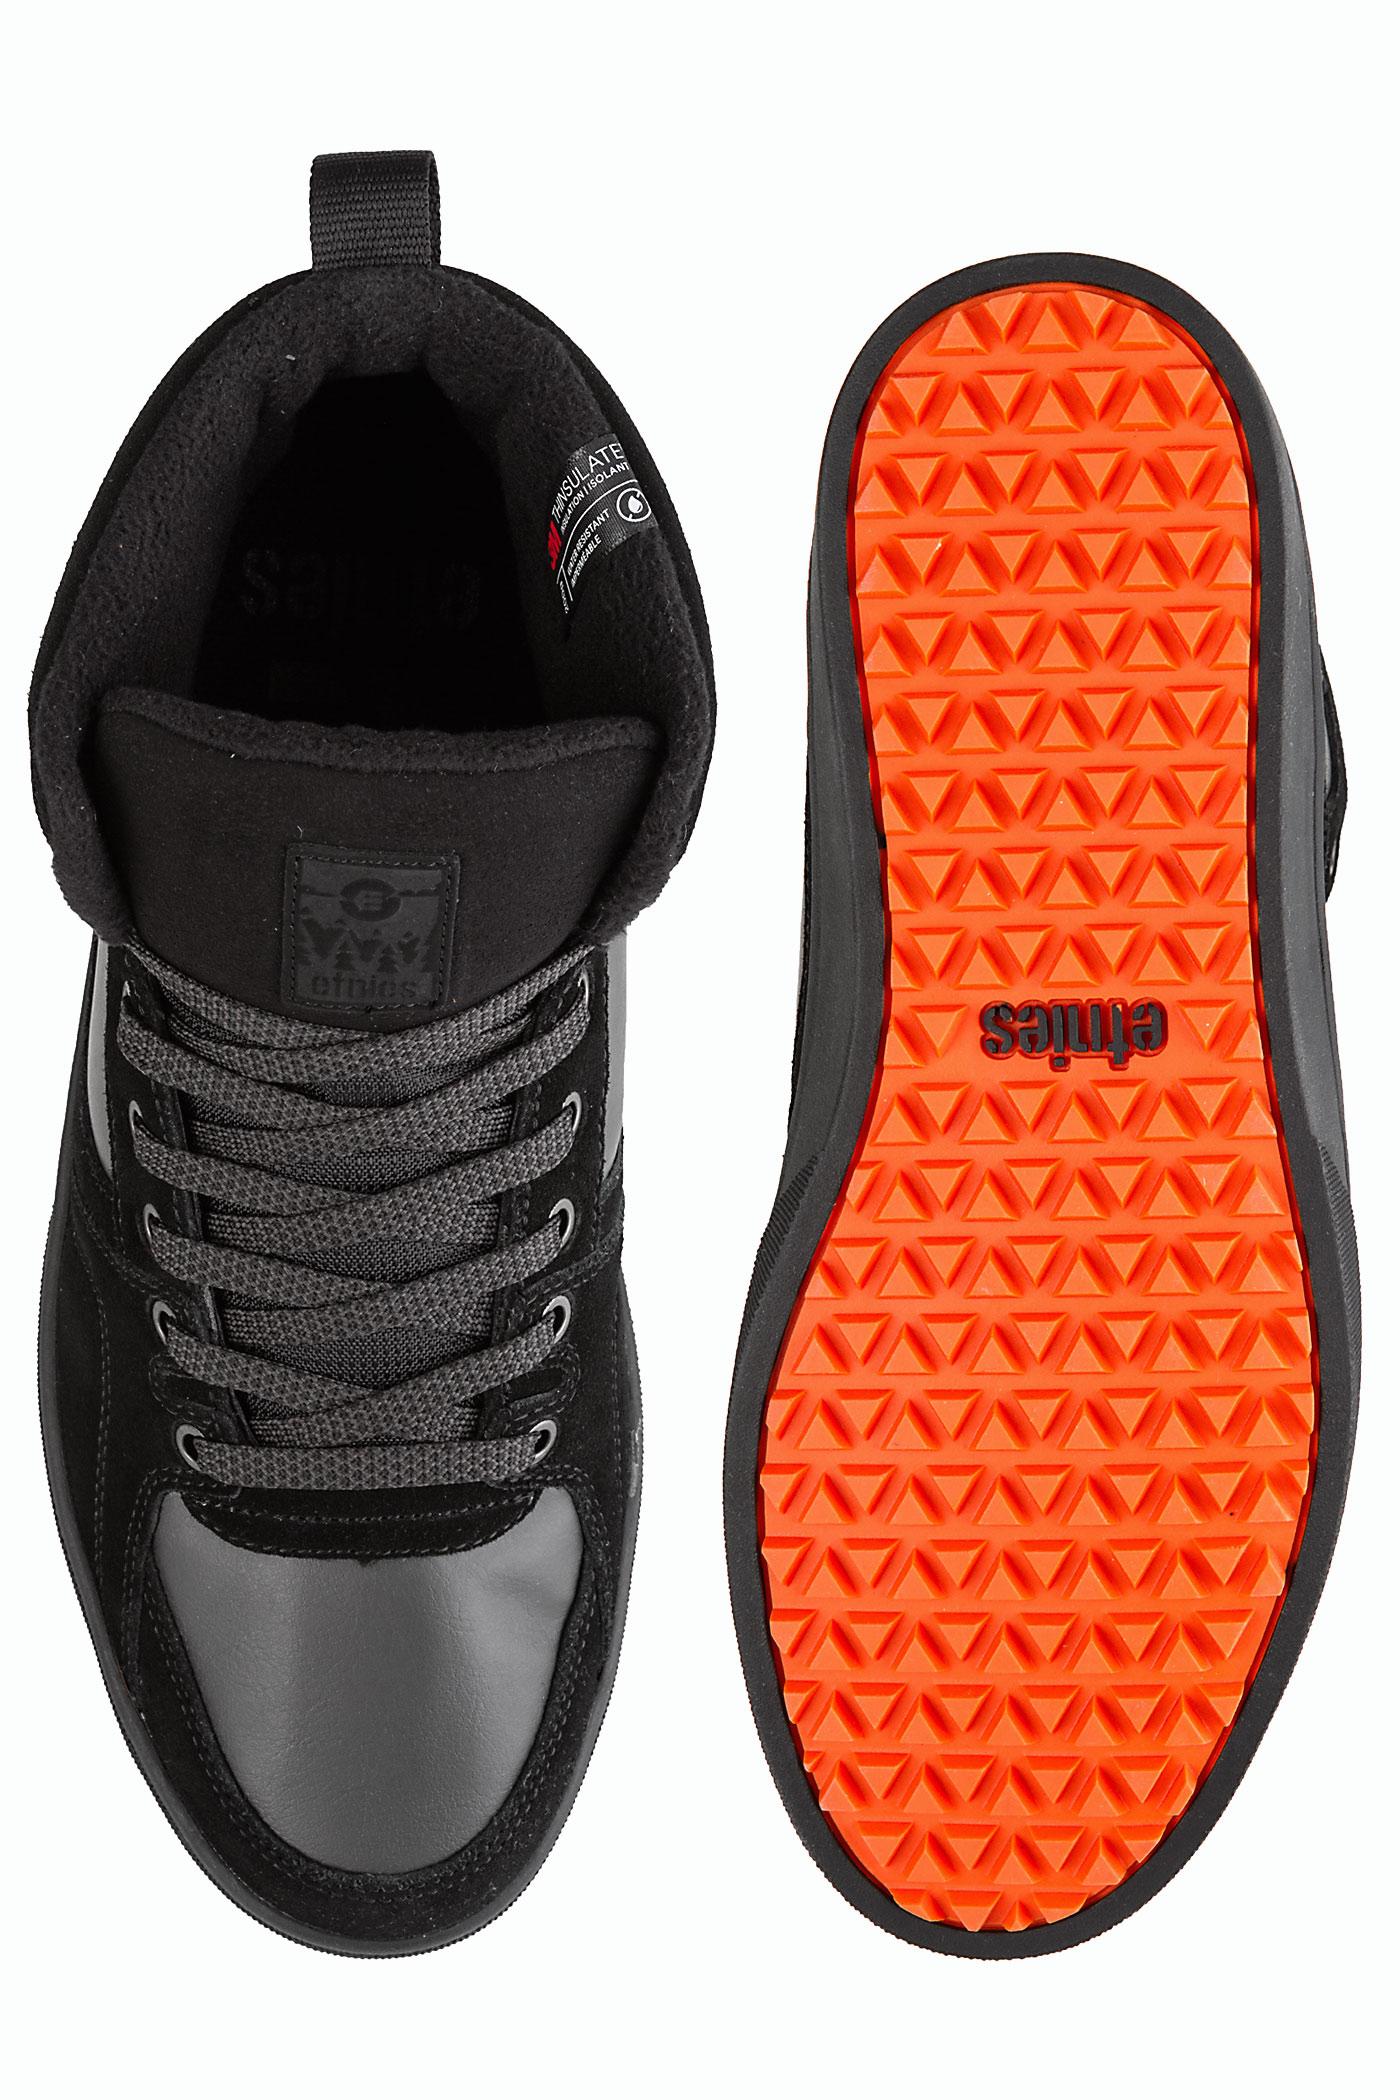 Dark Etnies Harrison Htw Grey Chaussureblack Gum RjL4A53q